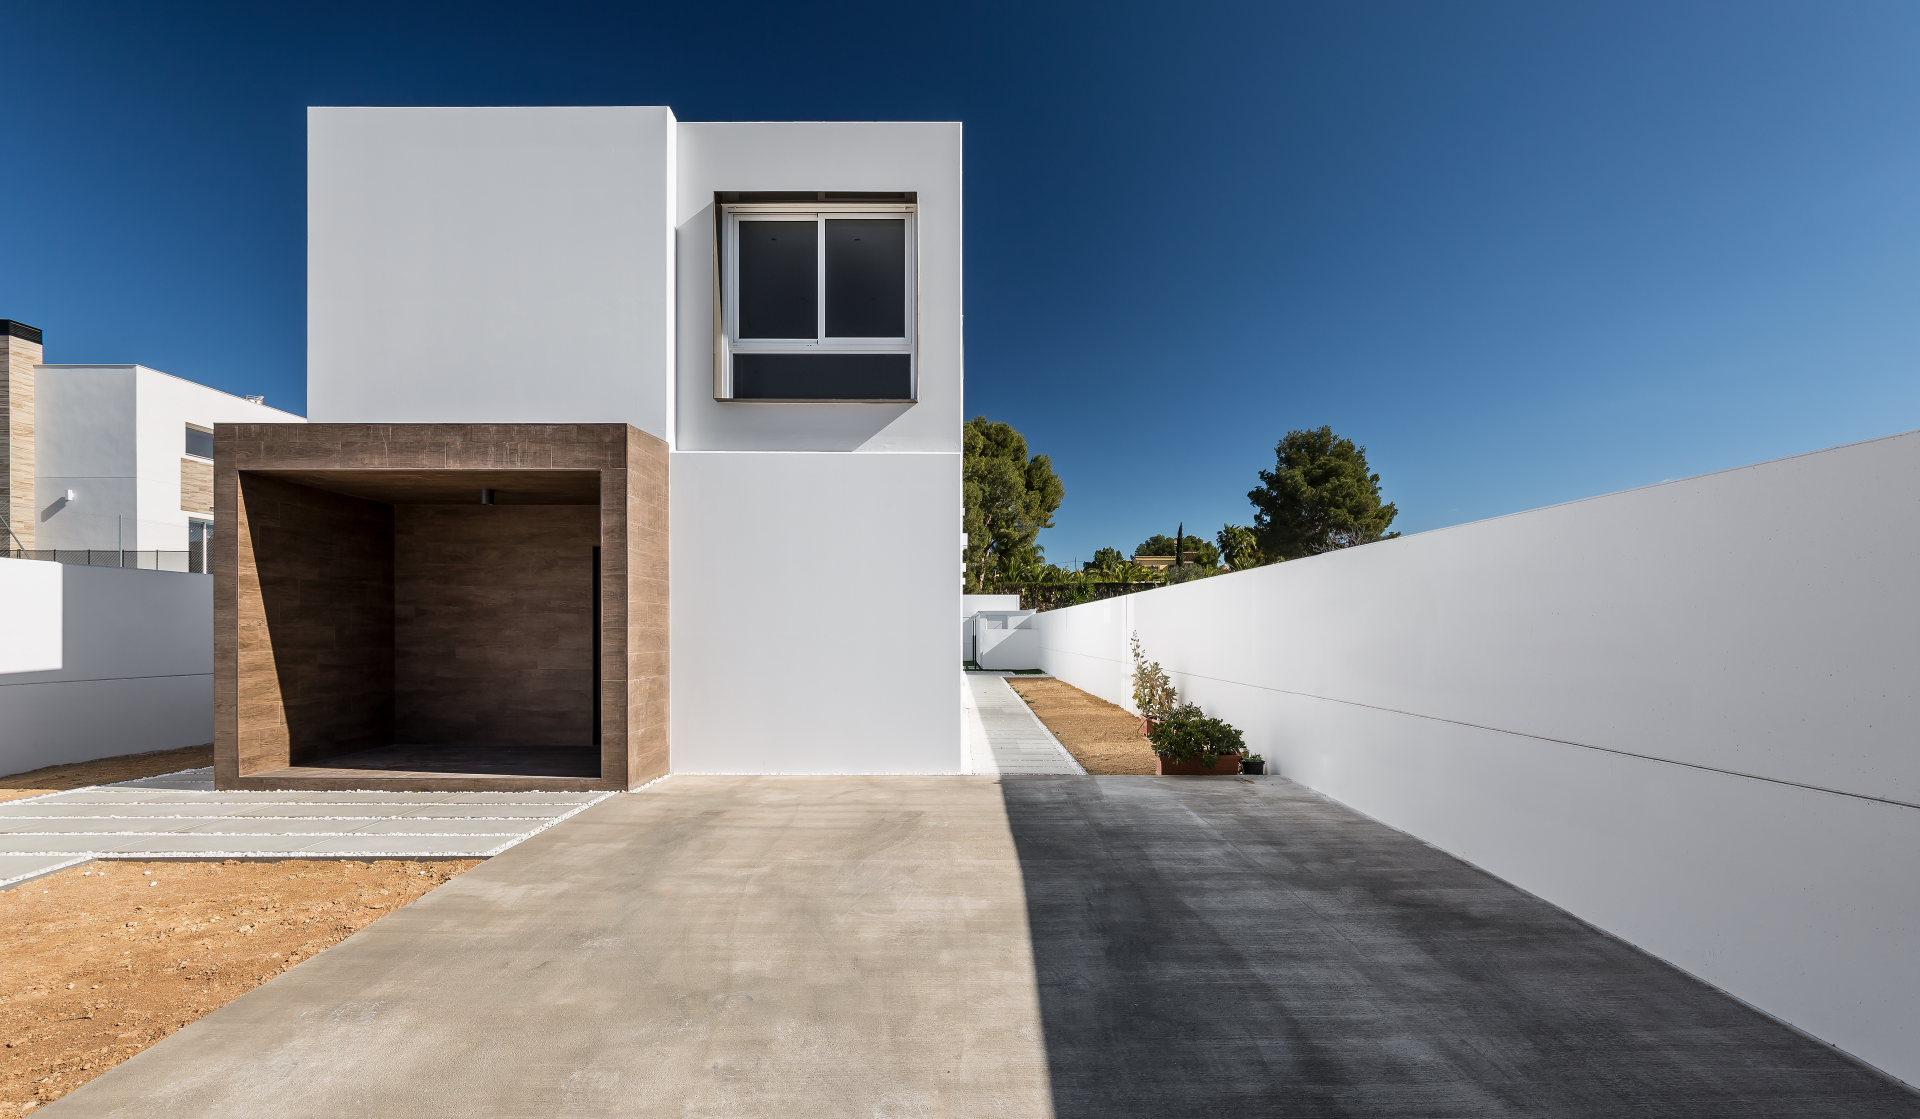 fotografia-arquitectura-valencia-german-cabo-viraje-san-antonio (2)